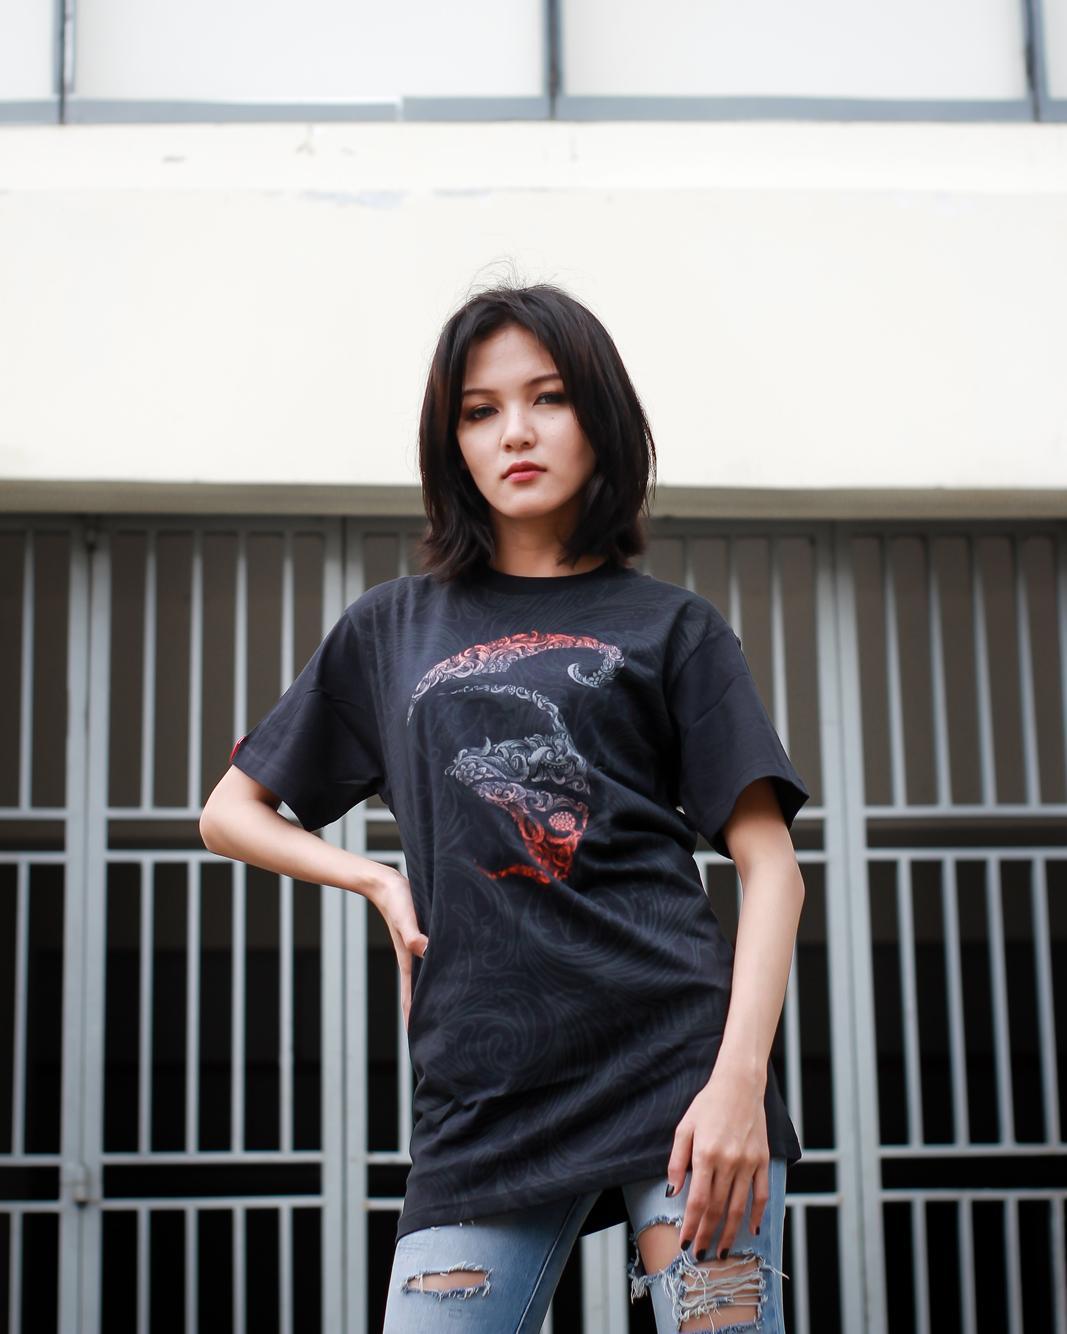 Culture Hero Kaos Distro Keren Budaya Indonesia: Logo Ornament SS